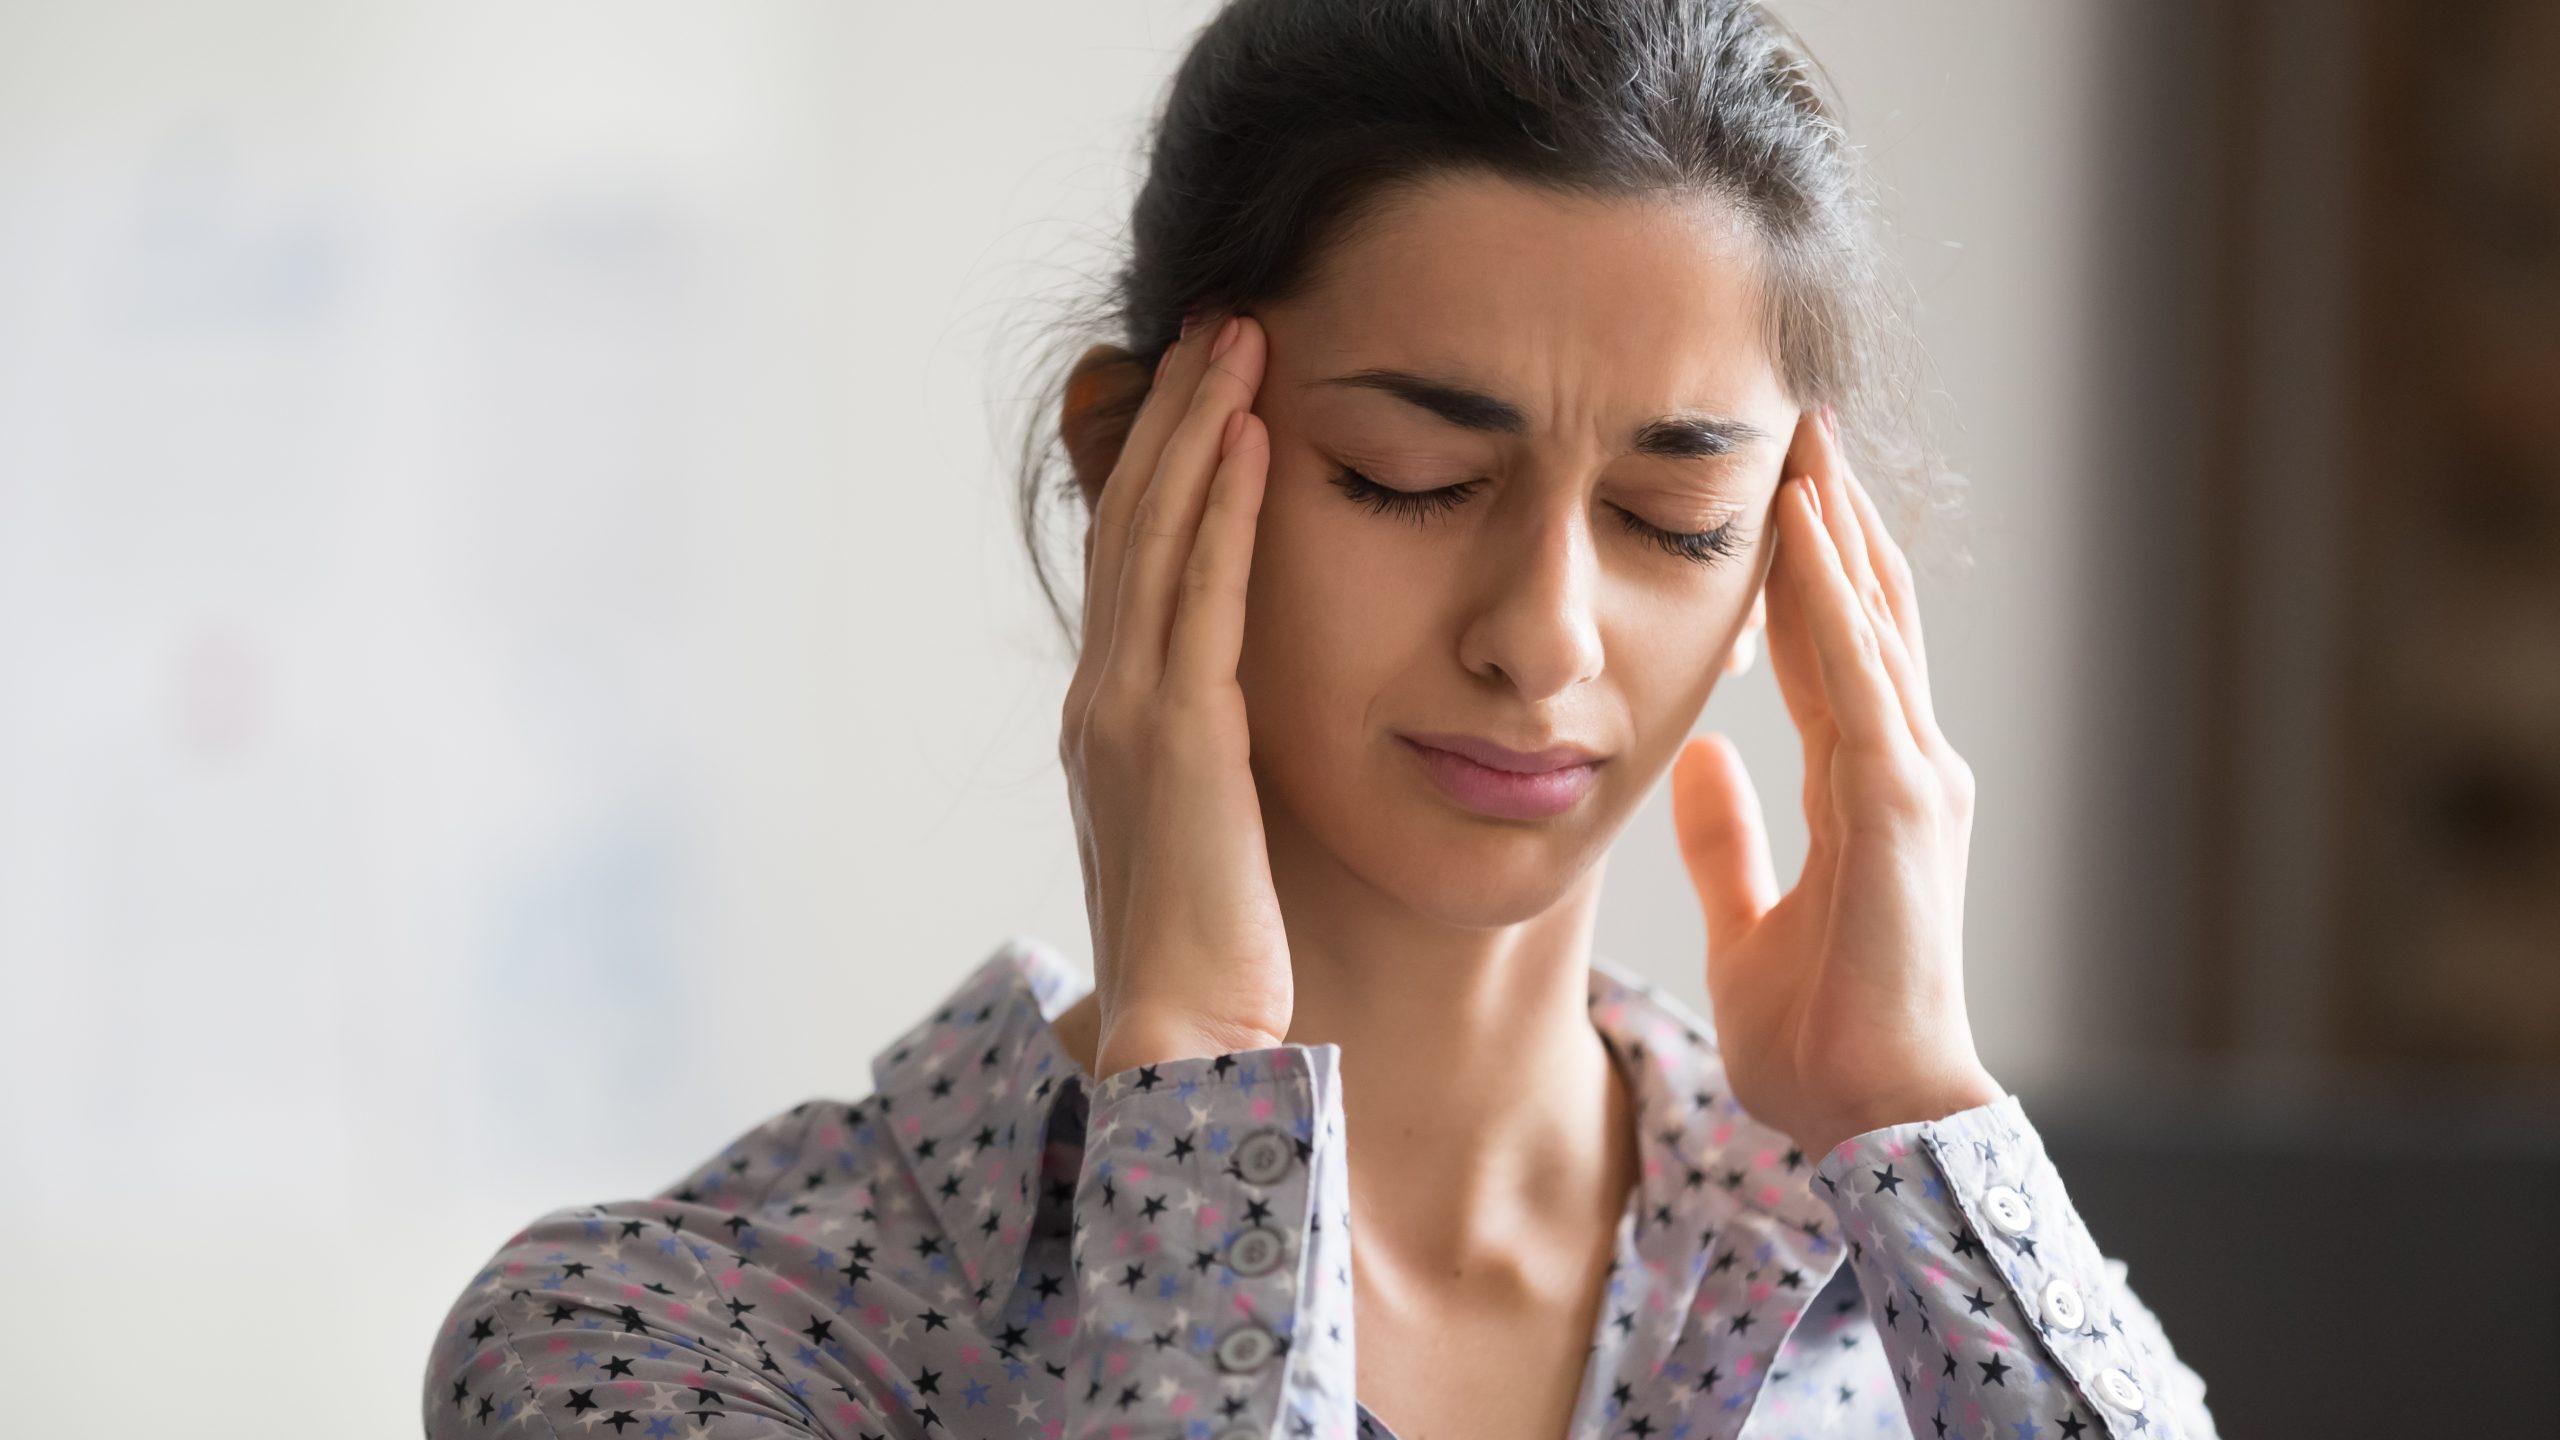 syosset headaches tmj disorder